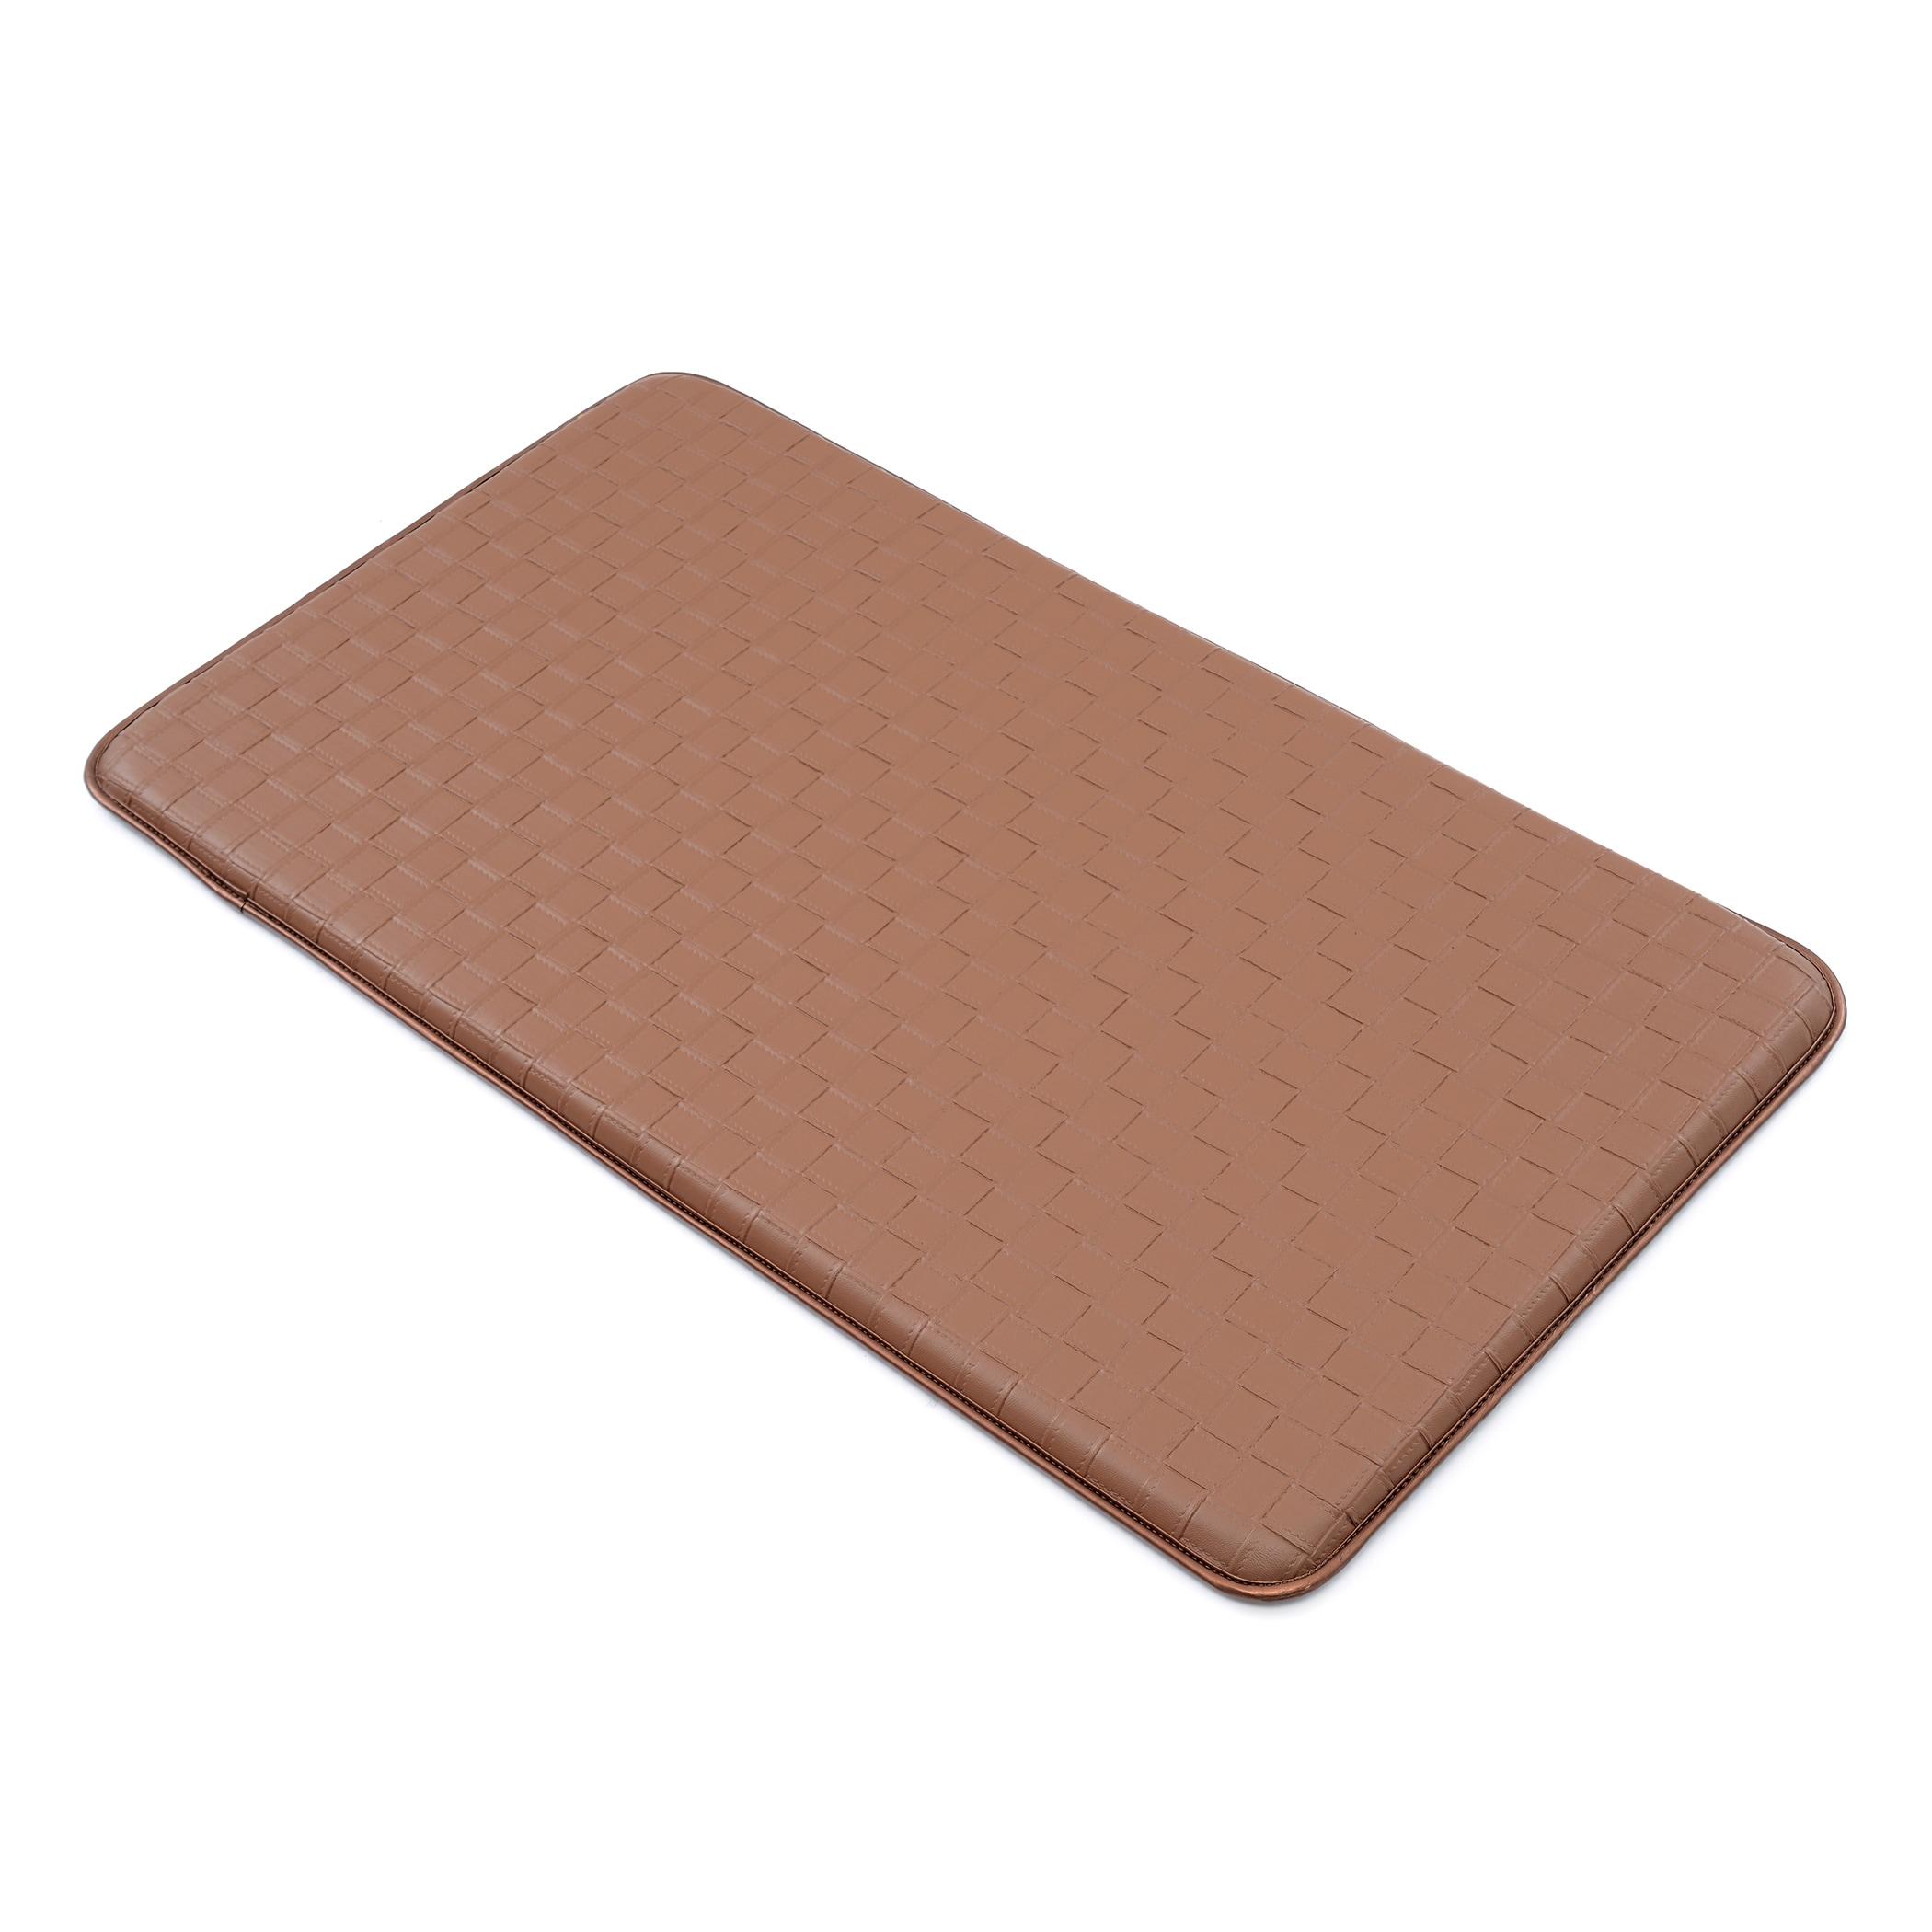 Contact Brand Soft Memory Foam Non-Slip Anti-Fatigue Kitchen Mat (20inches  x 36 inches)